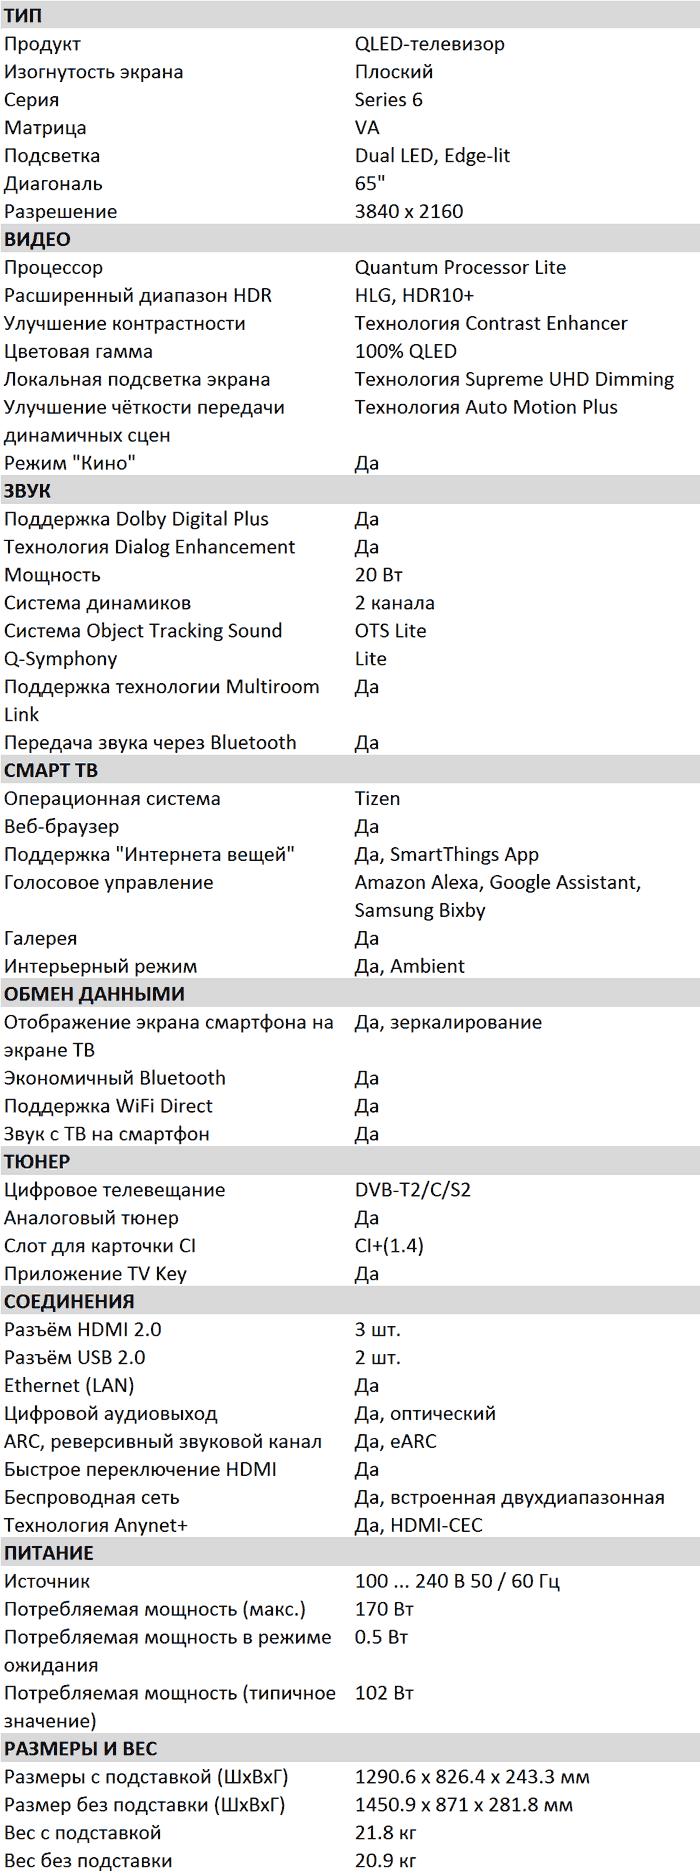 Характеристики Q60A